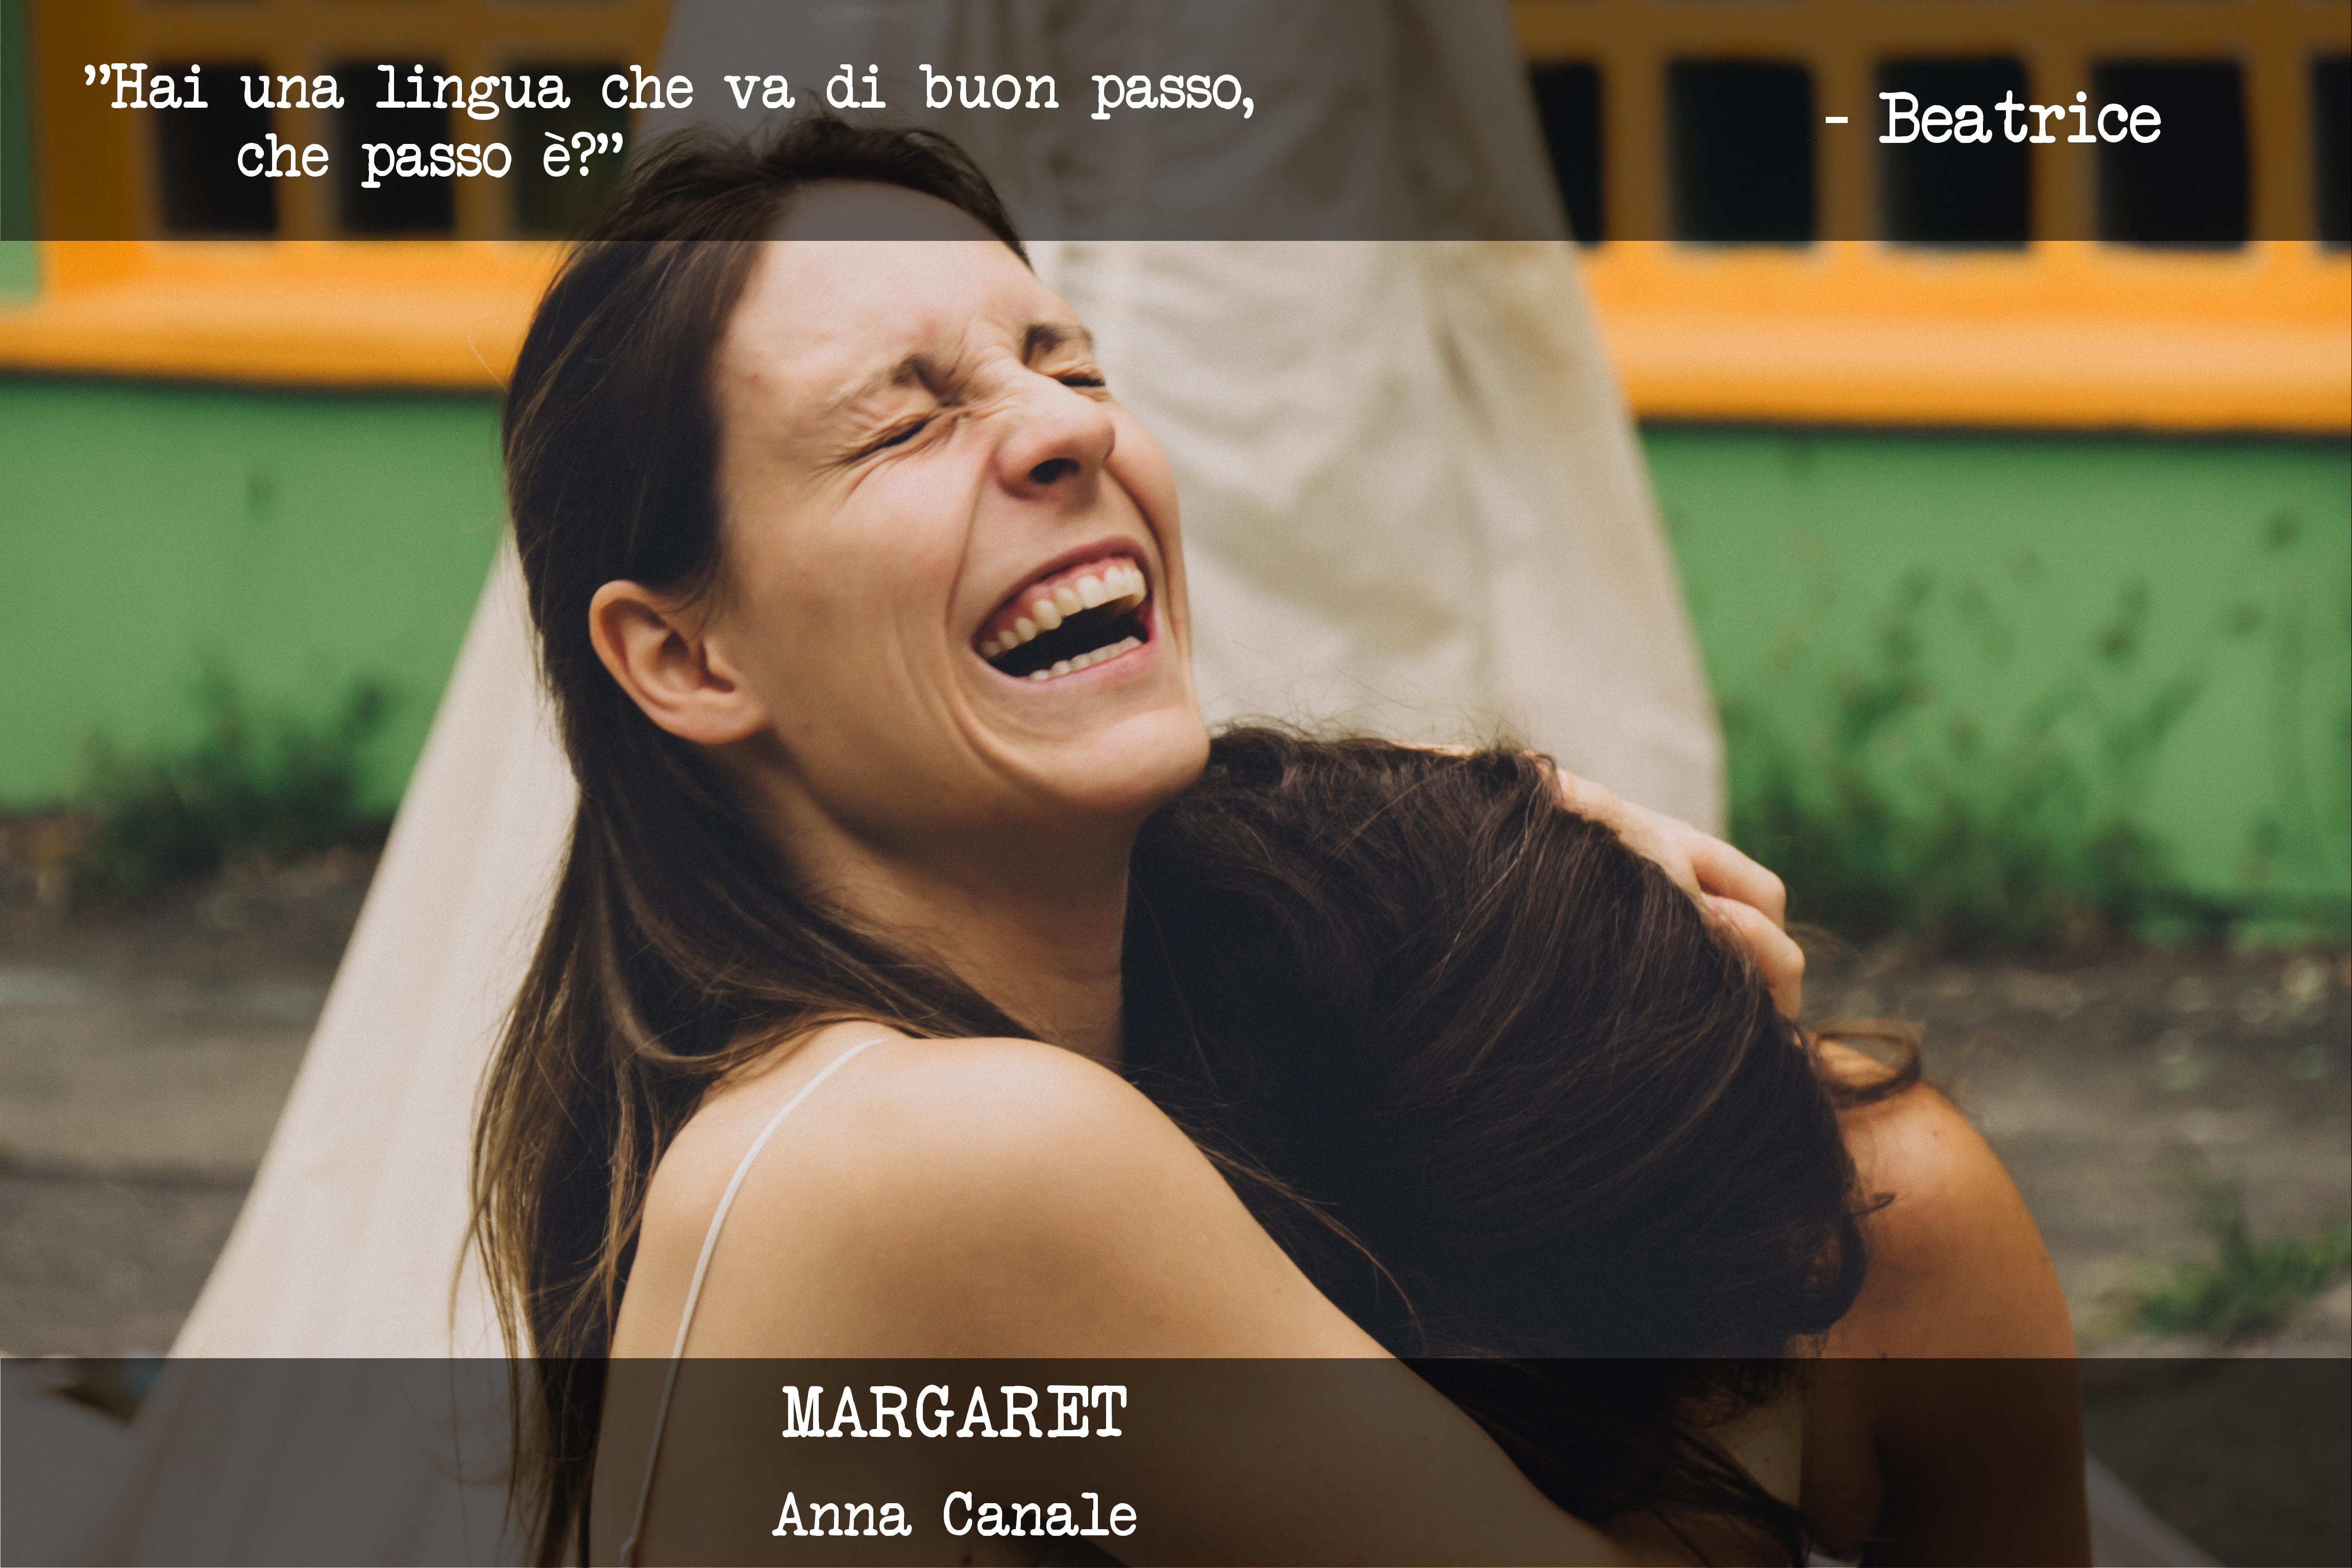 MARGARET - Anna Canale